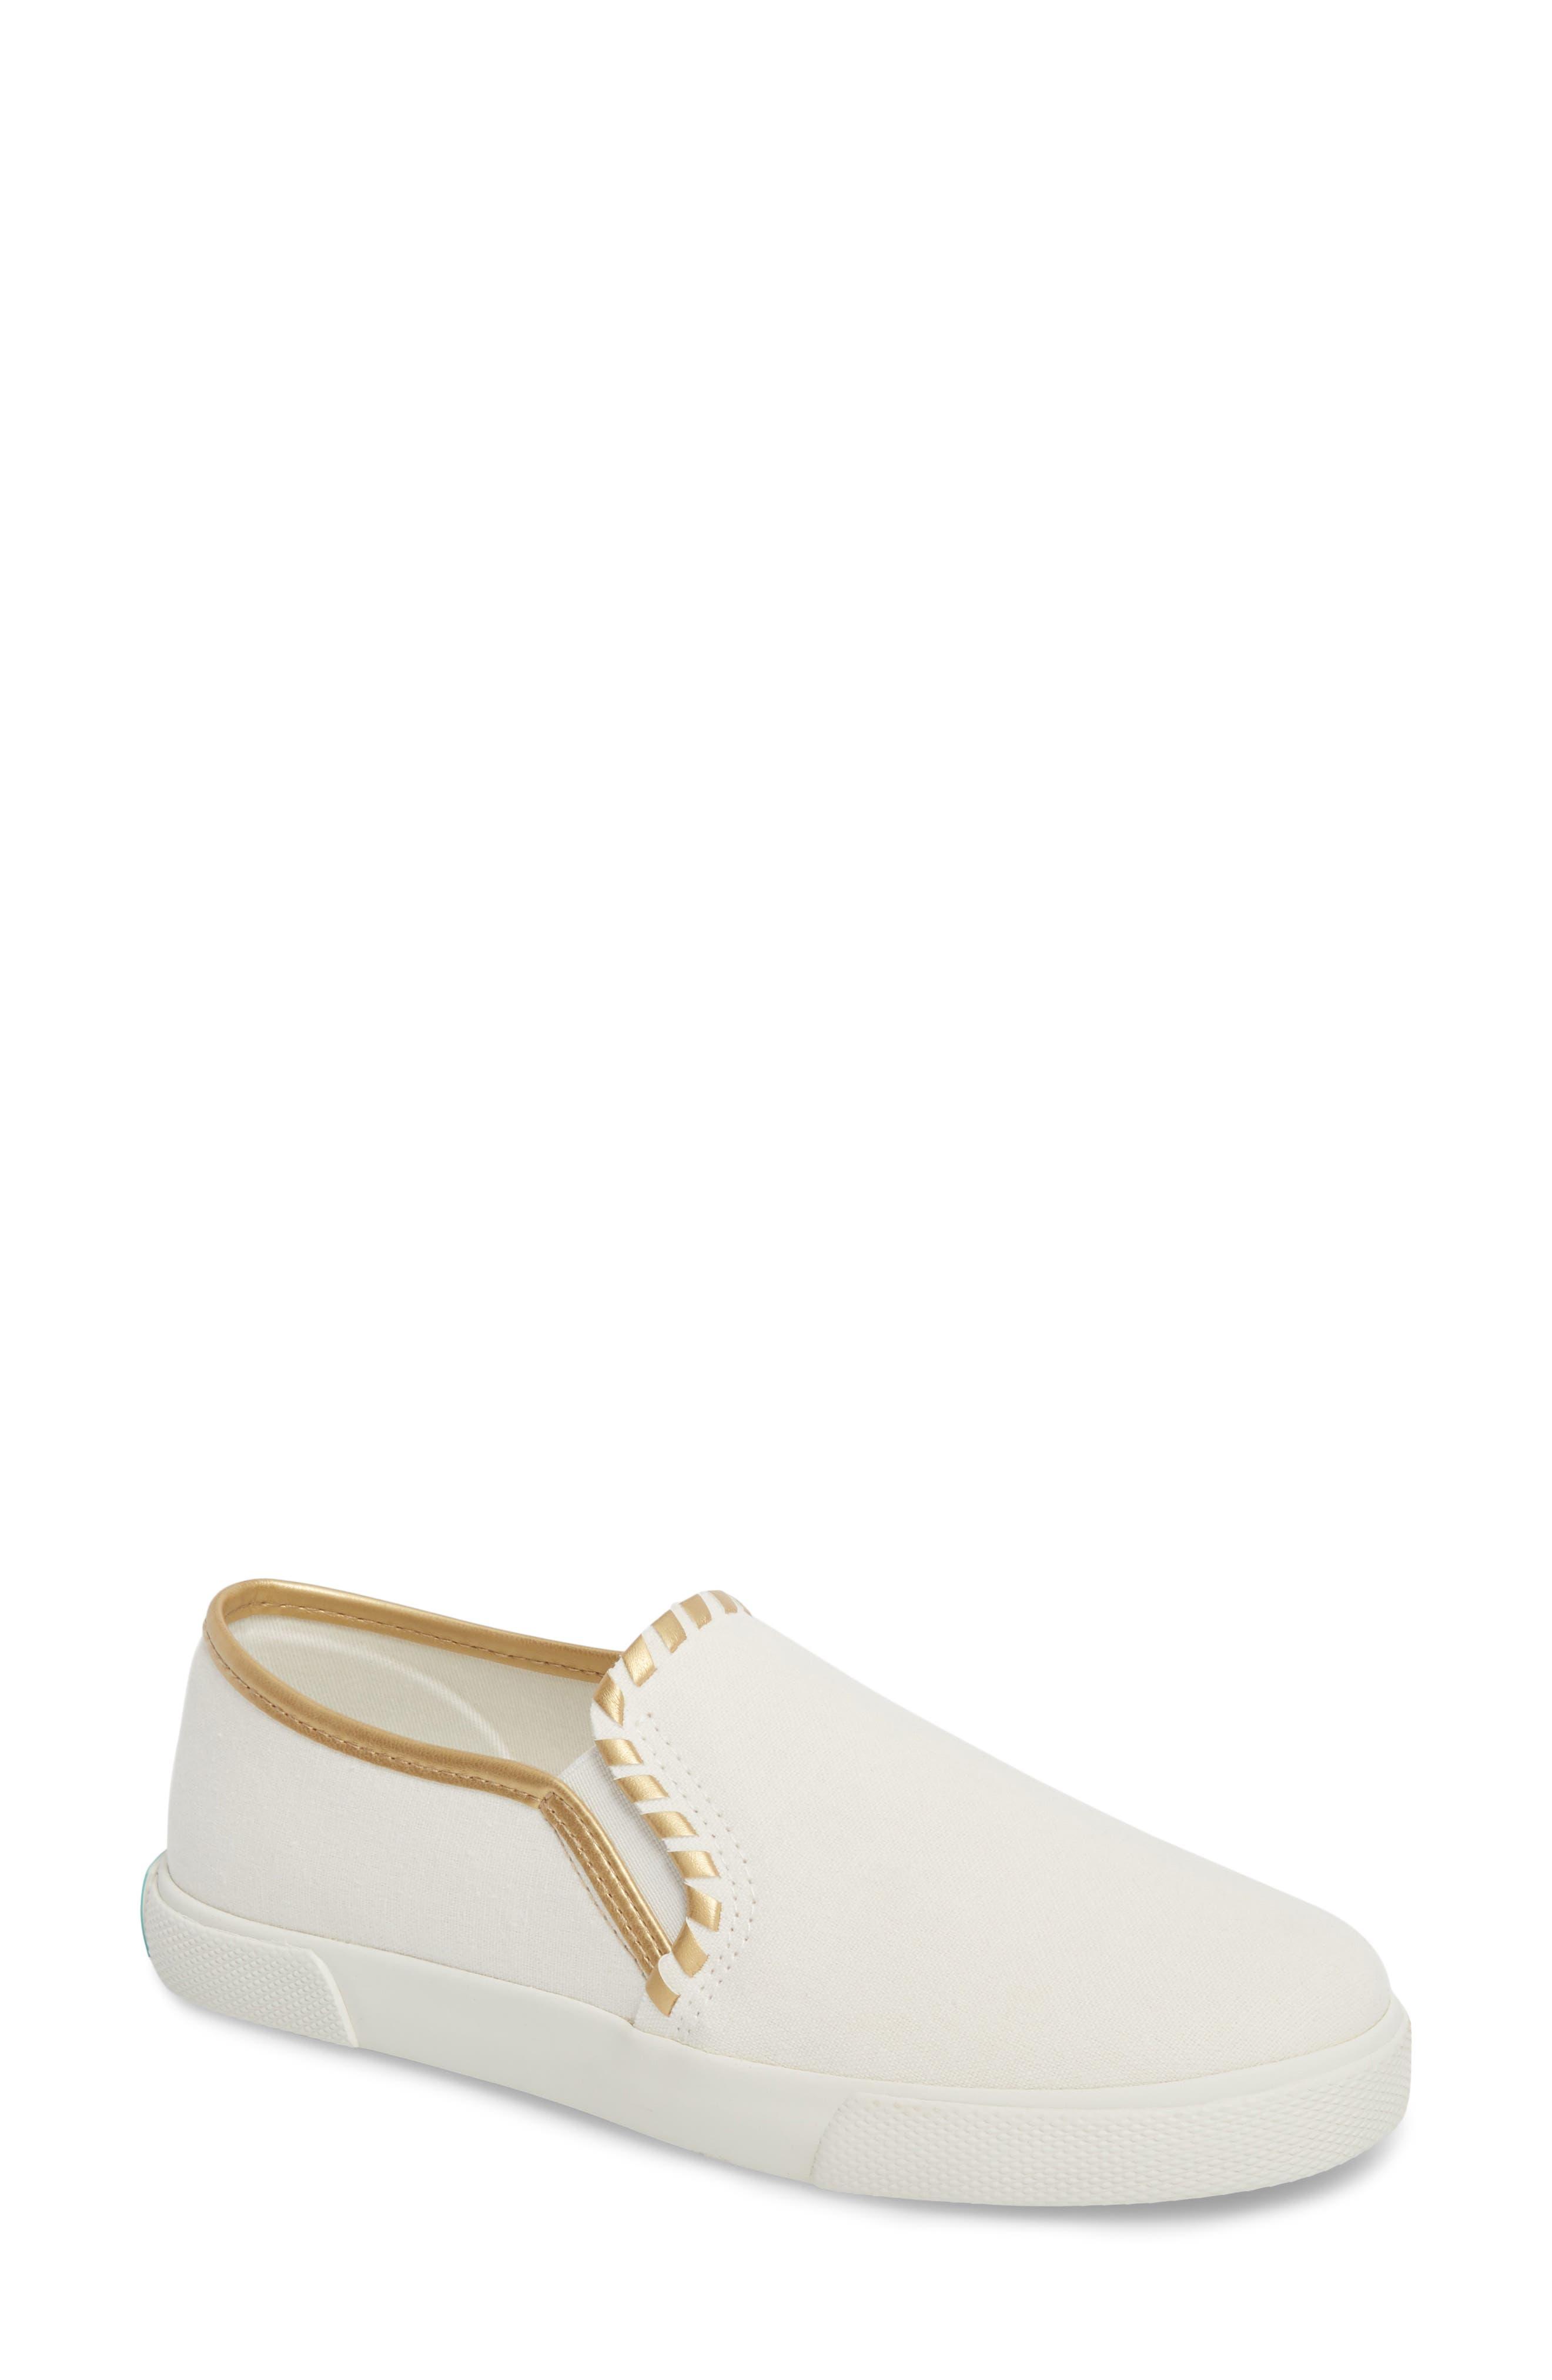 McKay Slip-On Sneaker,                         Main,                         color, 100